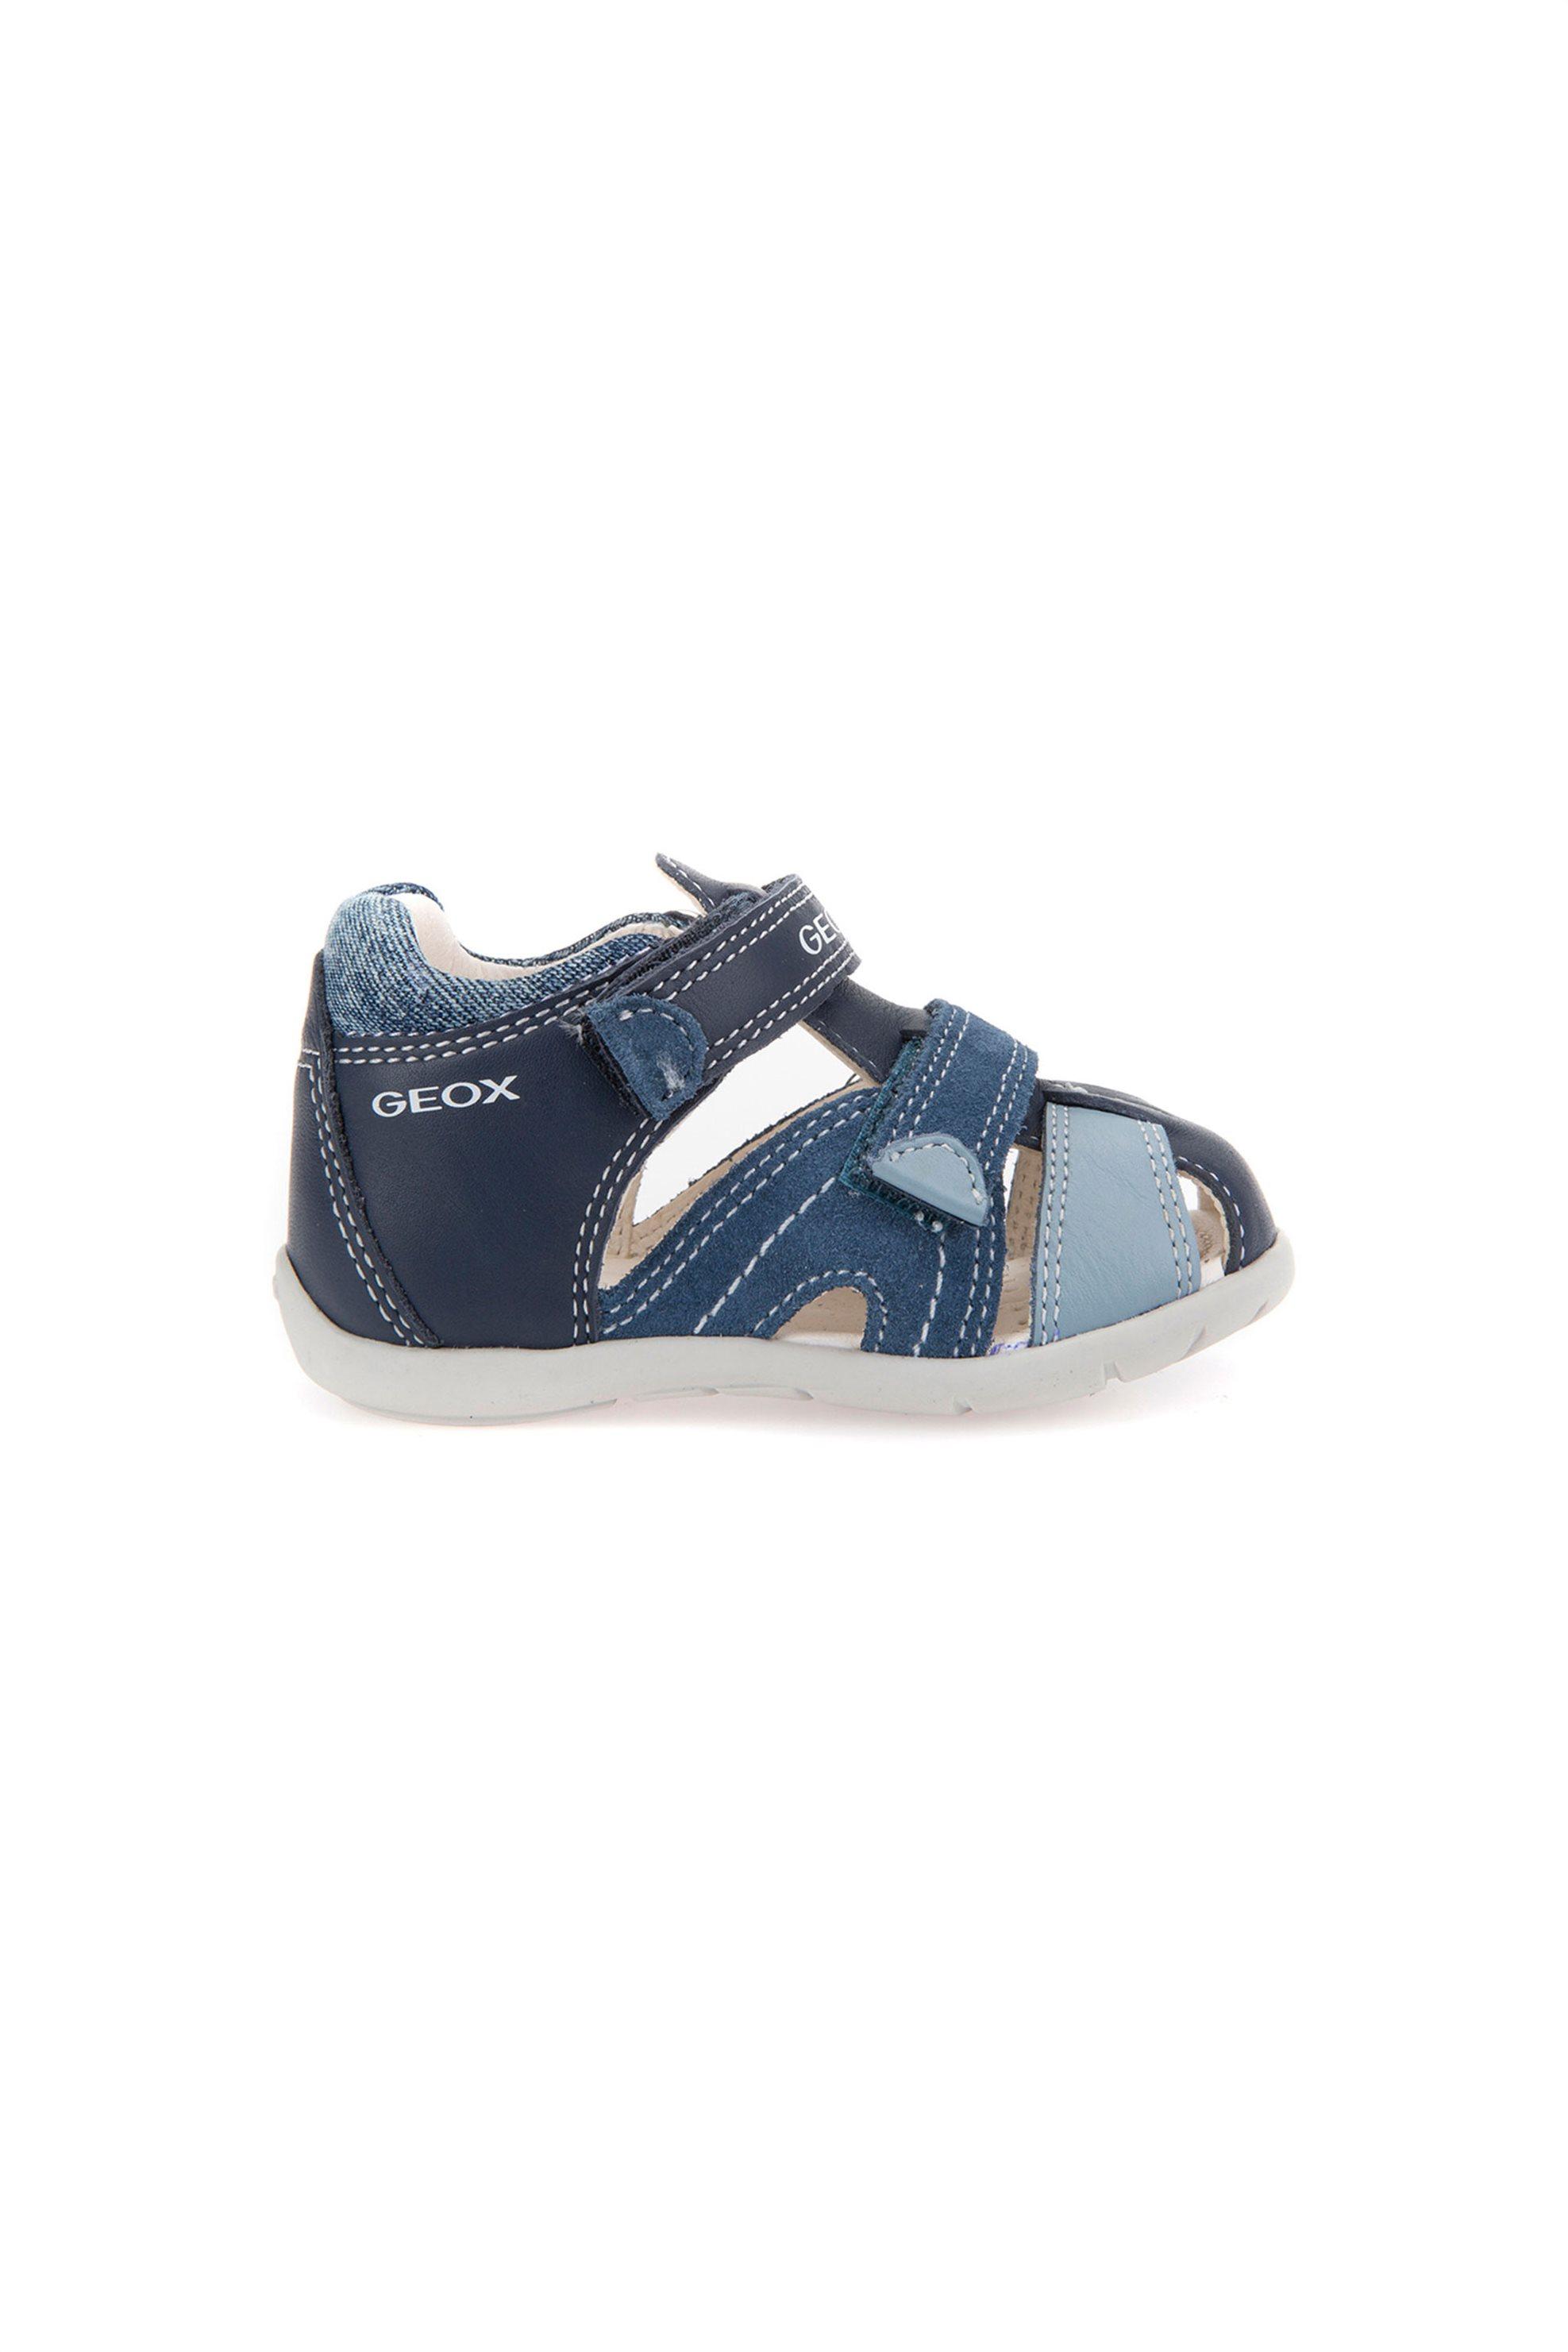 83fee53fb53 -30% Notos Βρεφικά παπούτσια Kaytan Boy Geox – B7250C – Μπλε Σκούρο